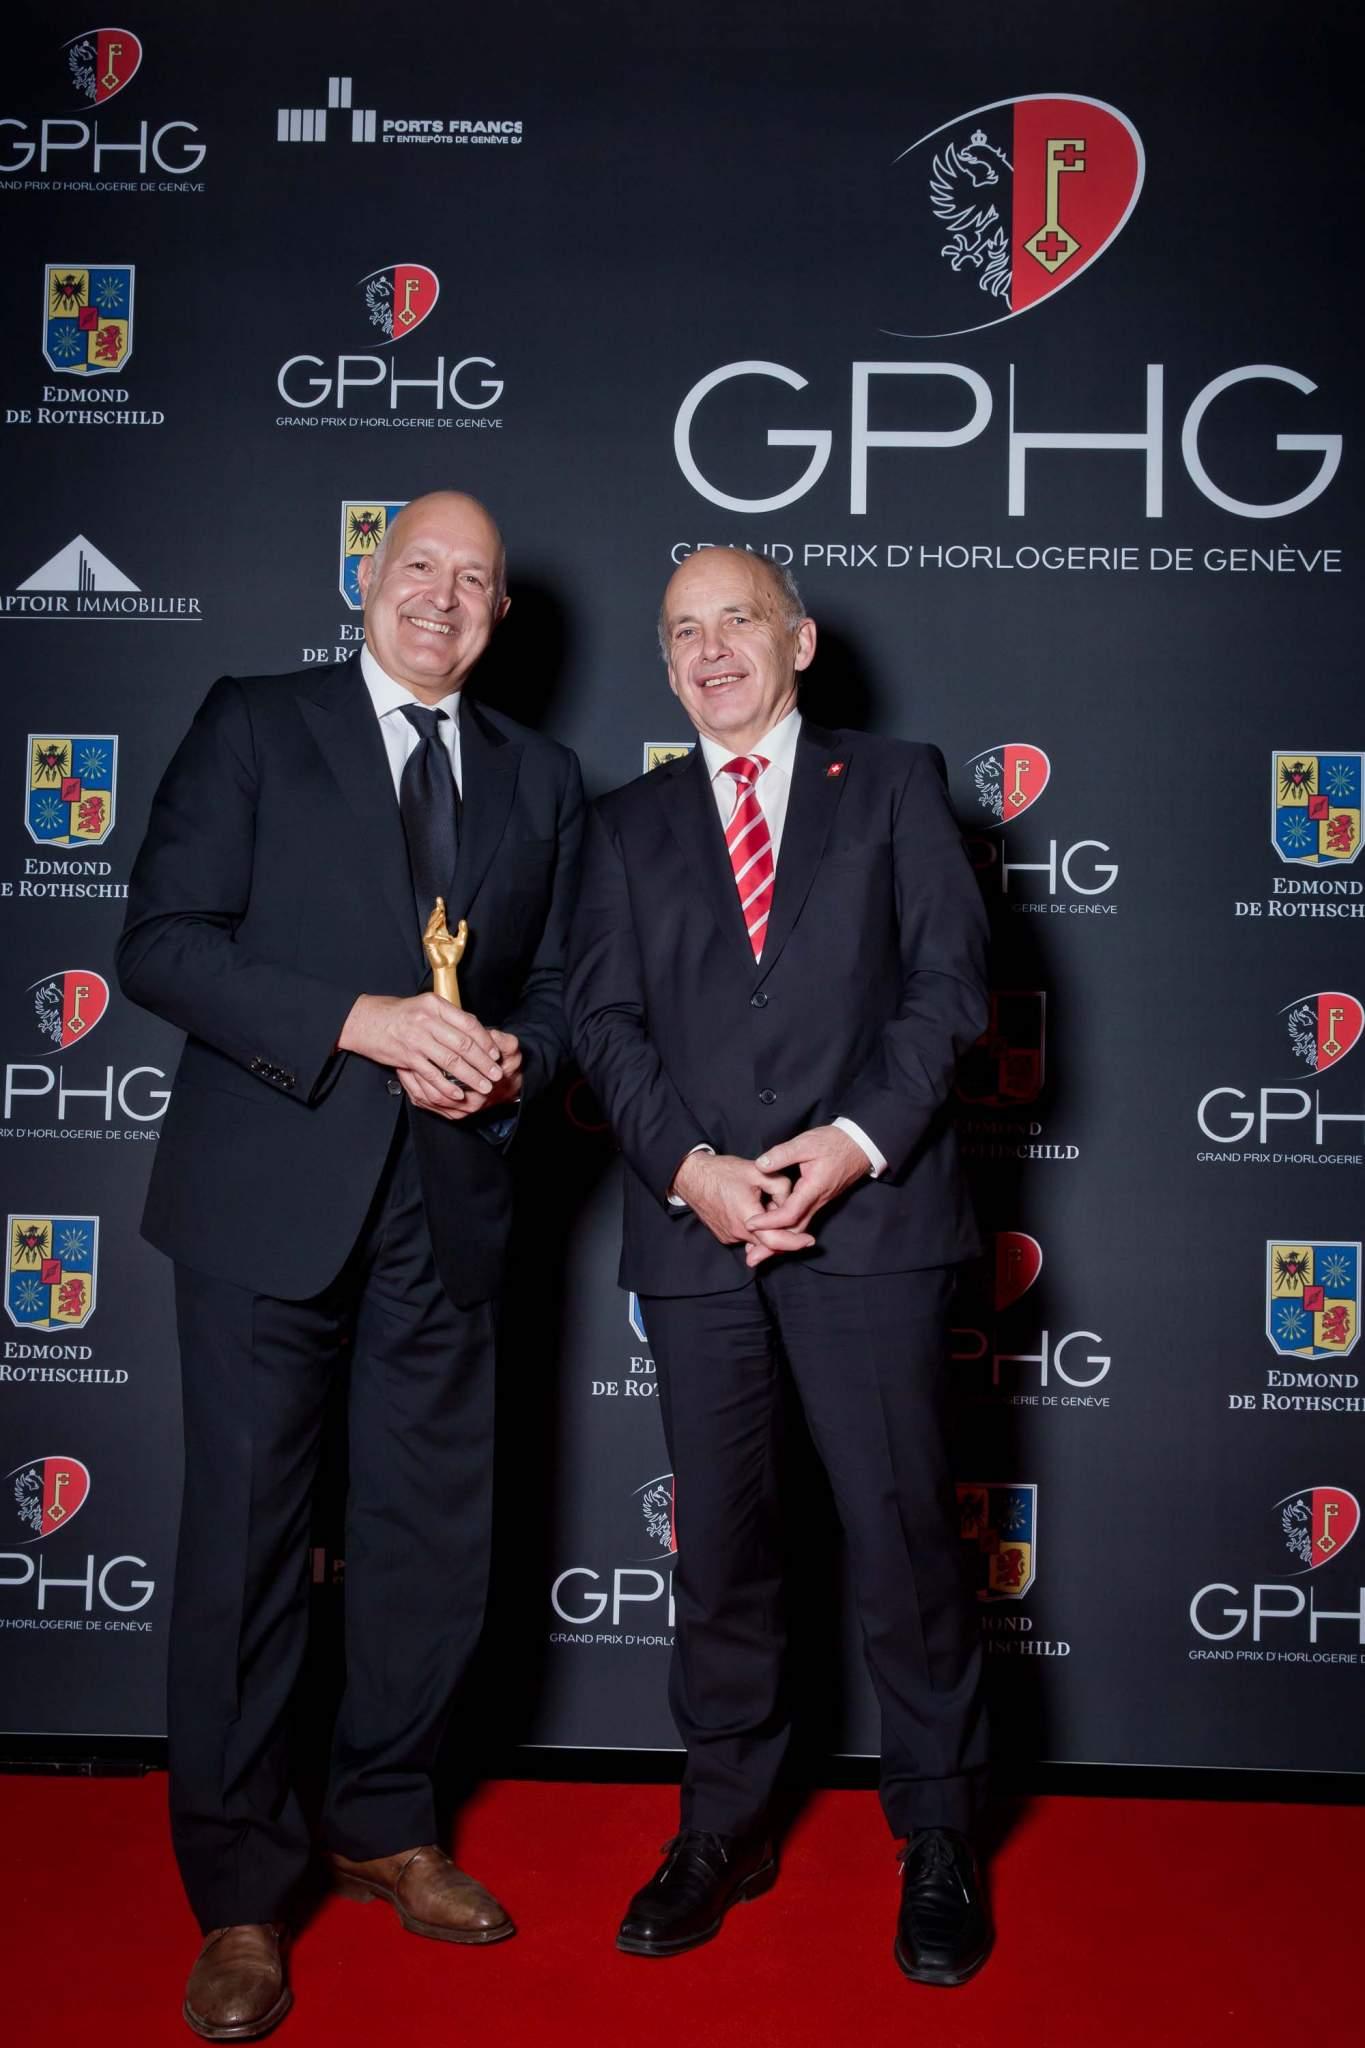 Michele Sofisti, CEO of Girard-Perregaux, and Ueli Maurer, President of the Swiss Confederation